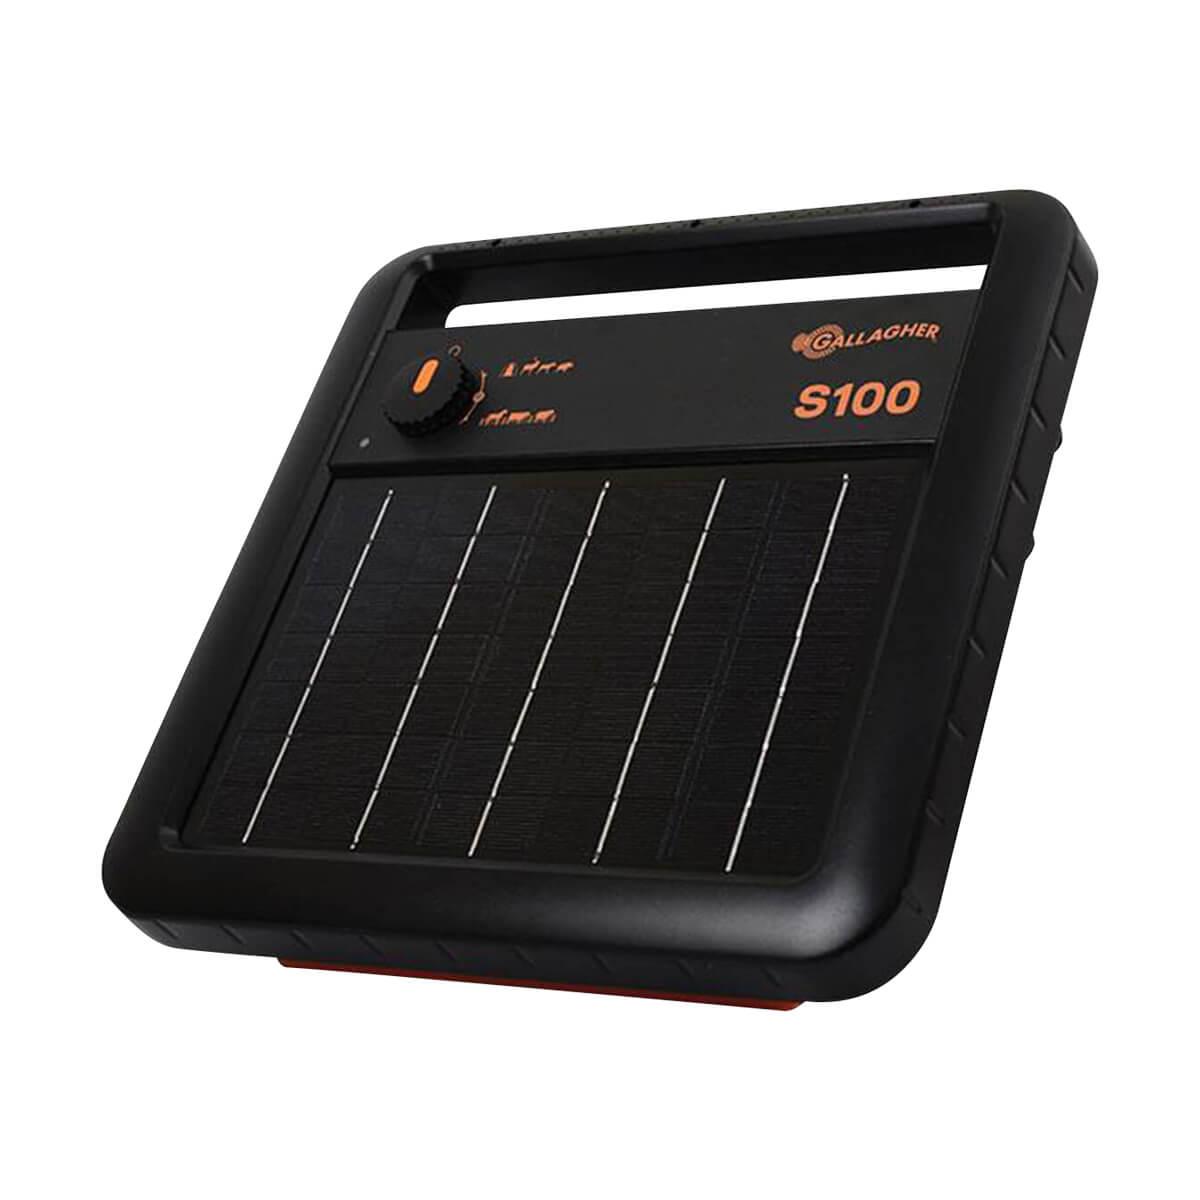 Gallagher Solar Fence Energizer S100